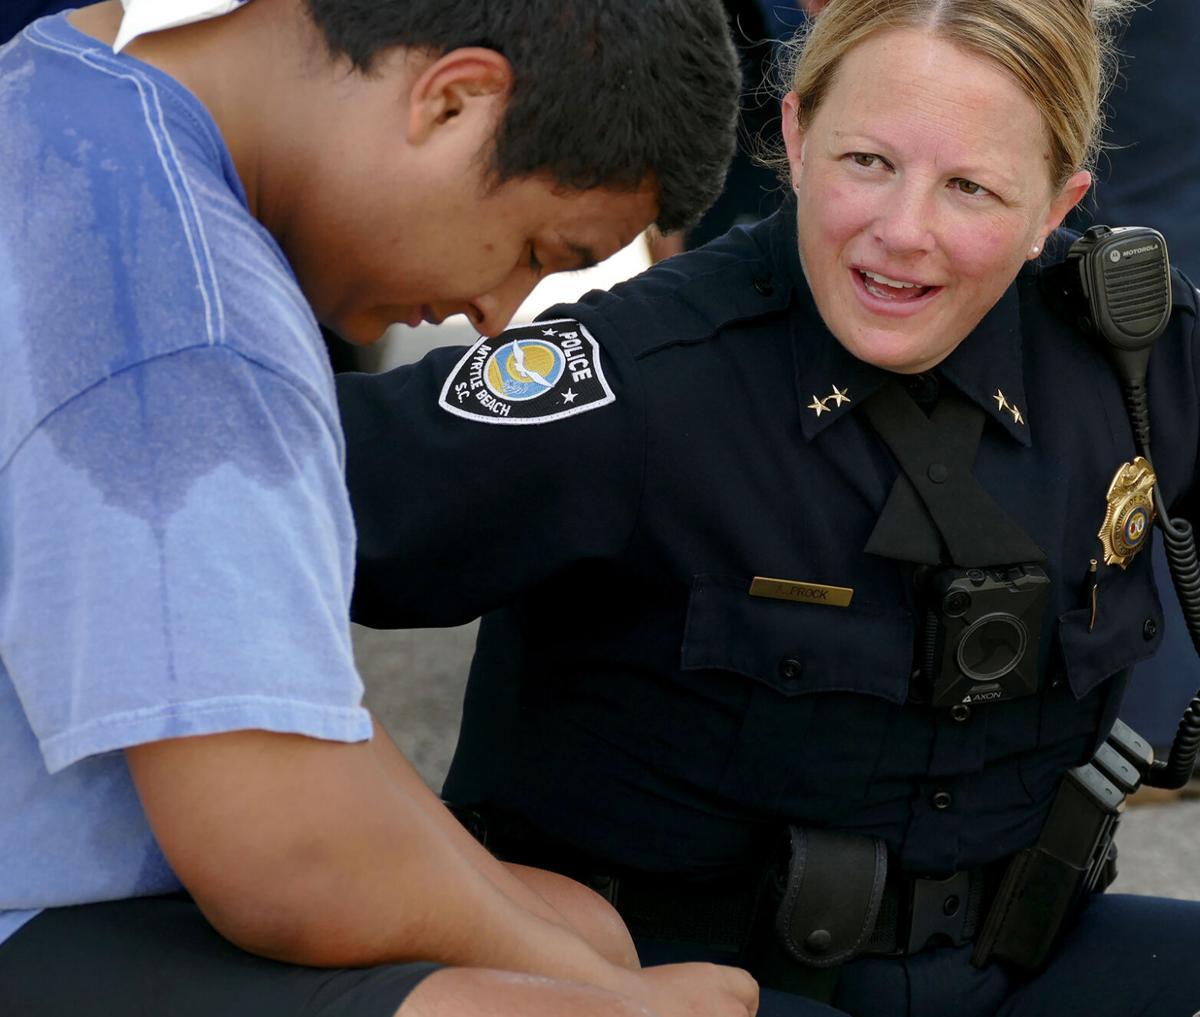 0717 MBPD police recruiting_JM01.JPG